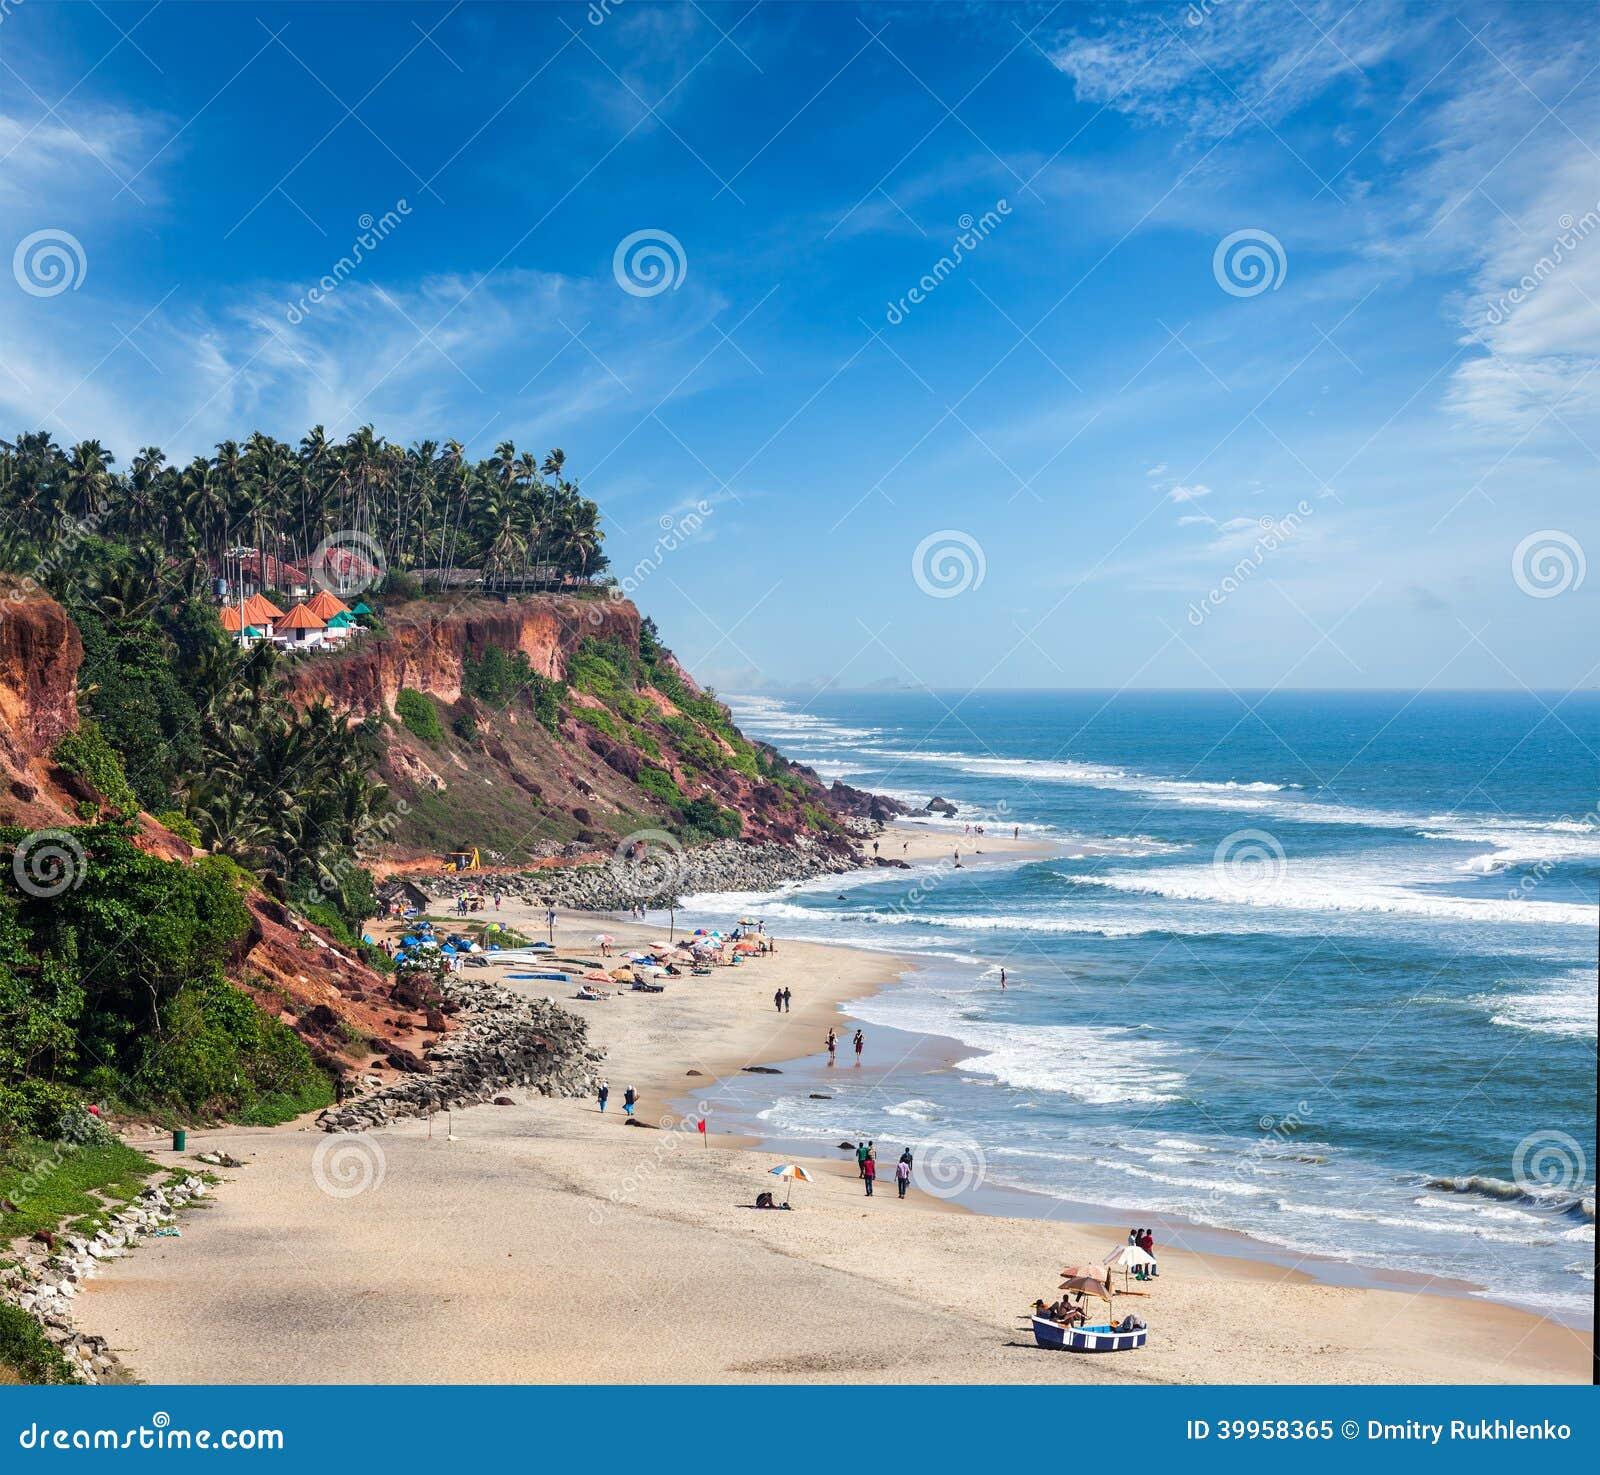 Best Beach Resorts In Chennai Ecr